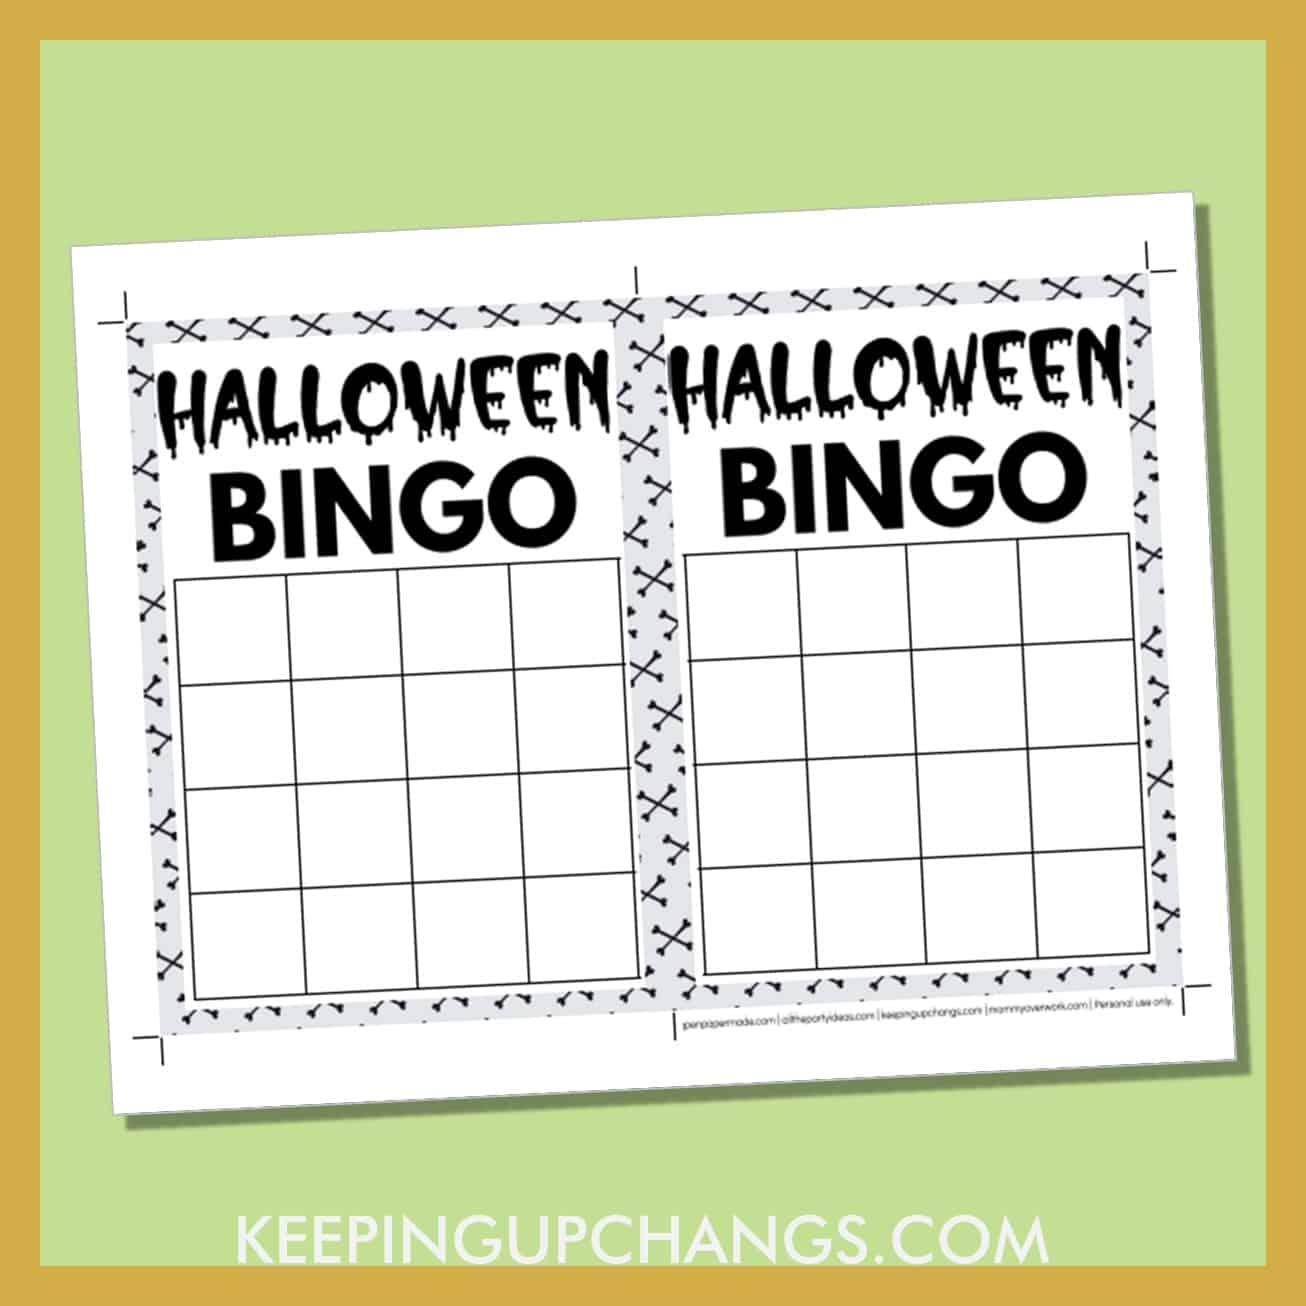 free halloween bingo 4x4 grid black white game board blank template.